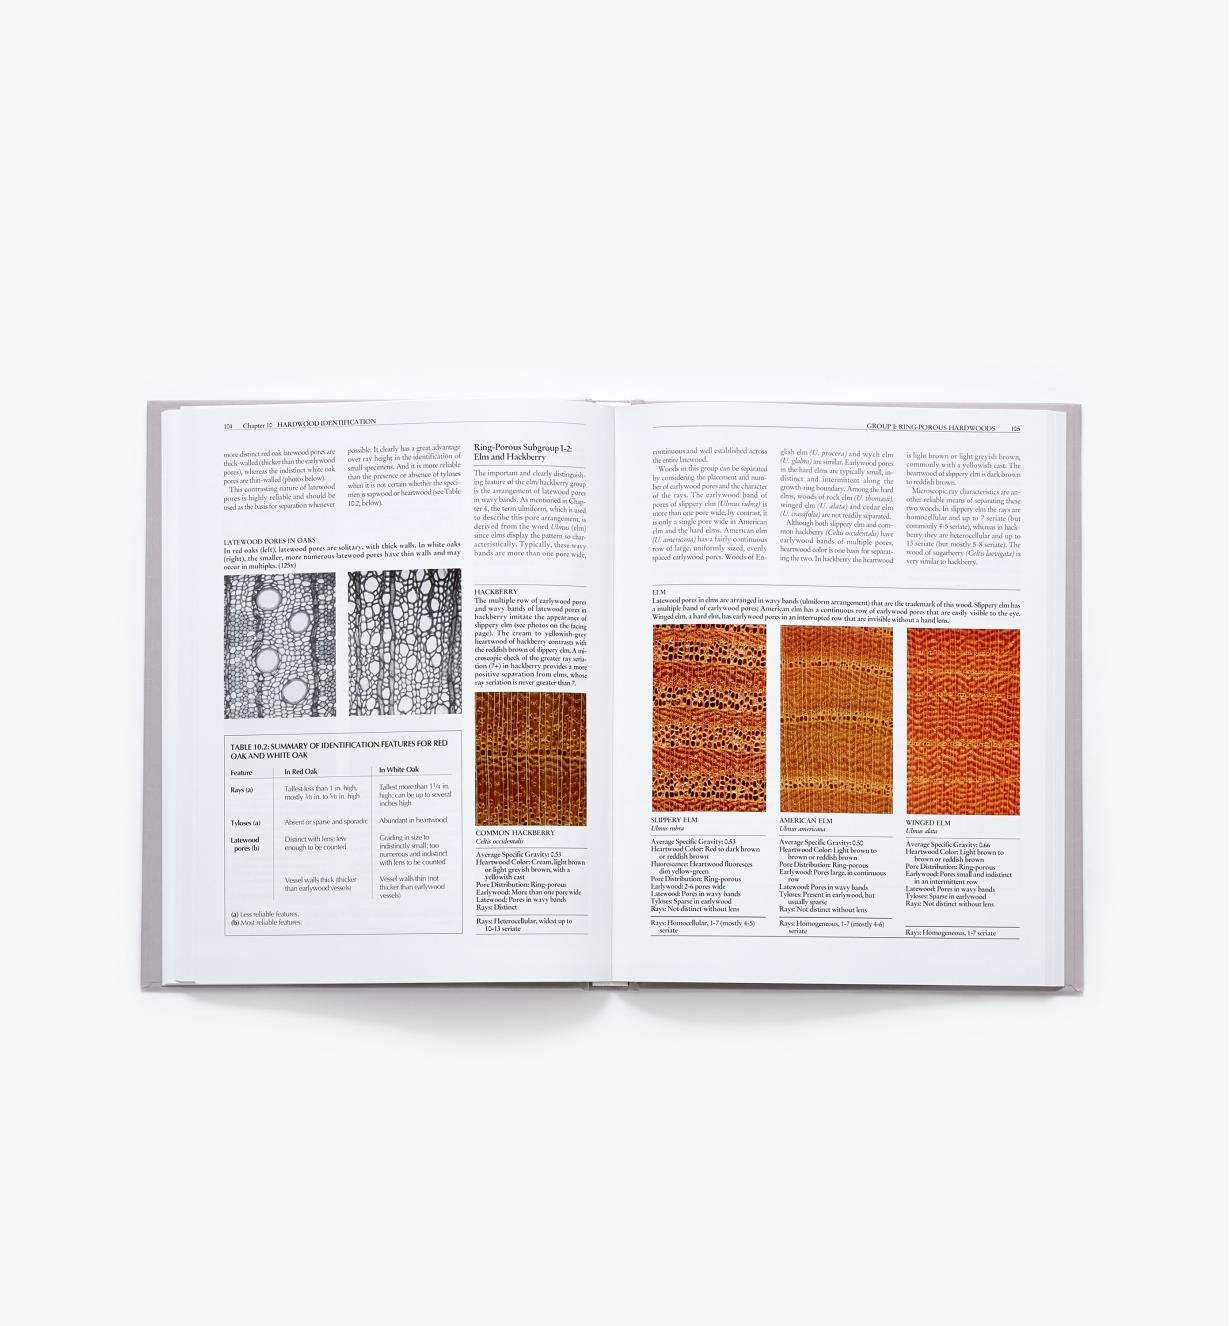 73L0117 - Identifying Wood